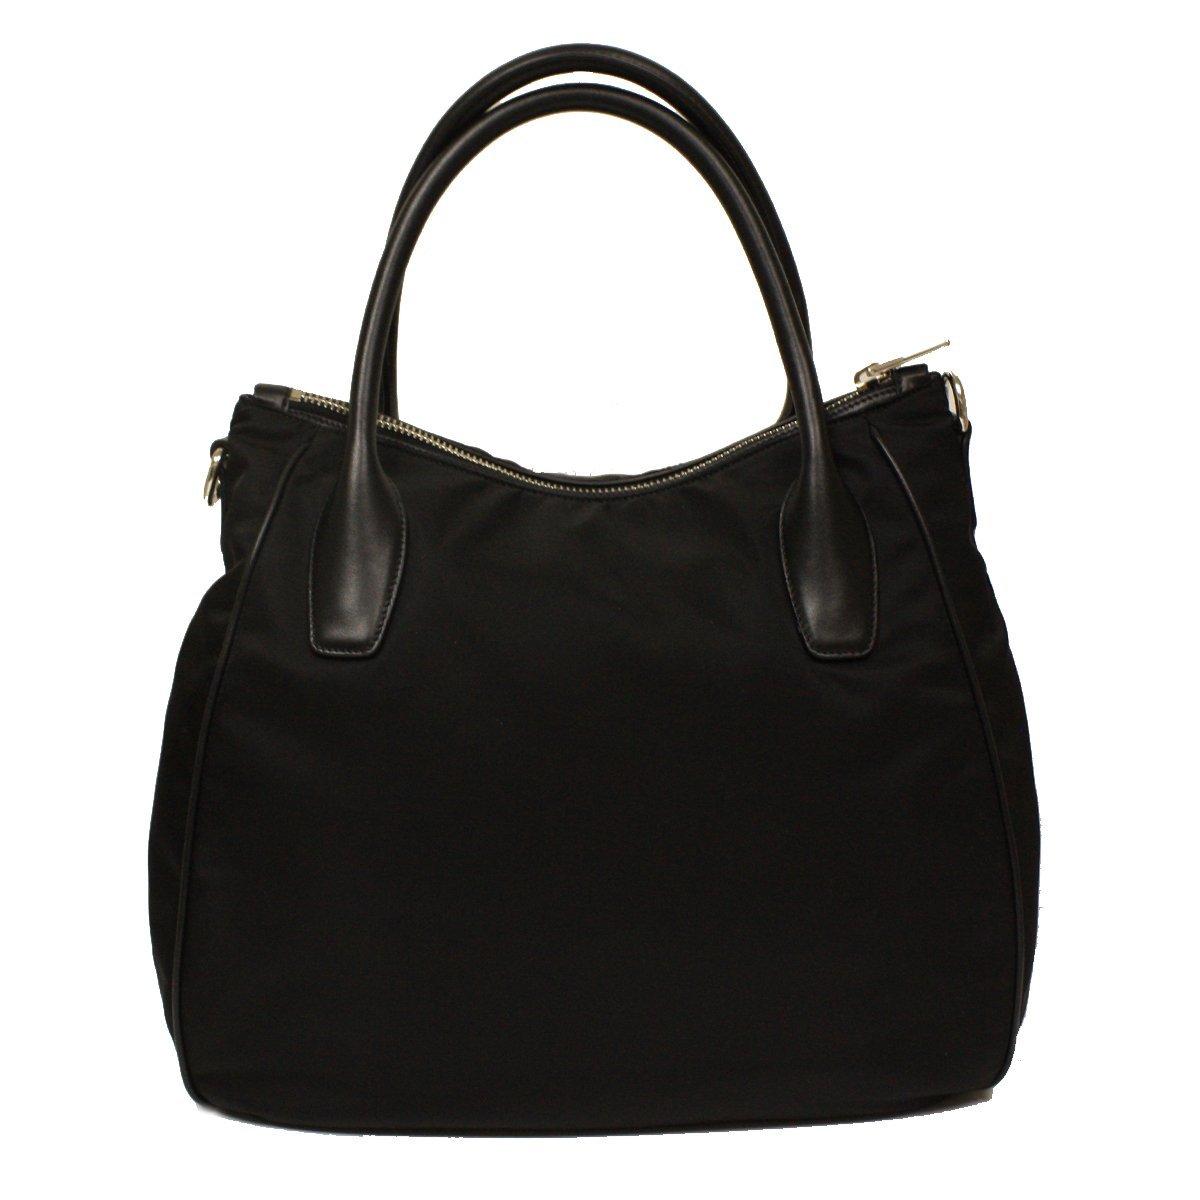 1ecf40820b488 Amazon.com  Prada Nero Black Tessuto Soft Calf Leather and Nylon Hobo  Handbag BR4992  Shoes